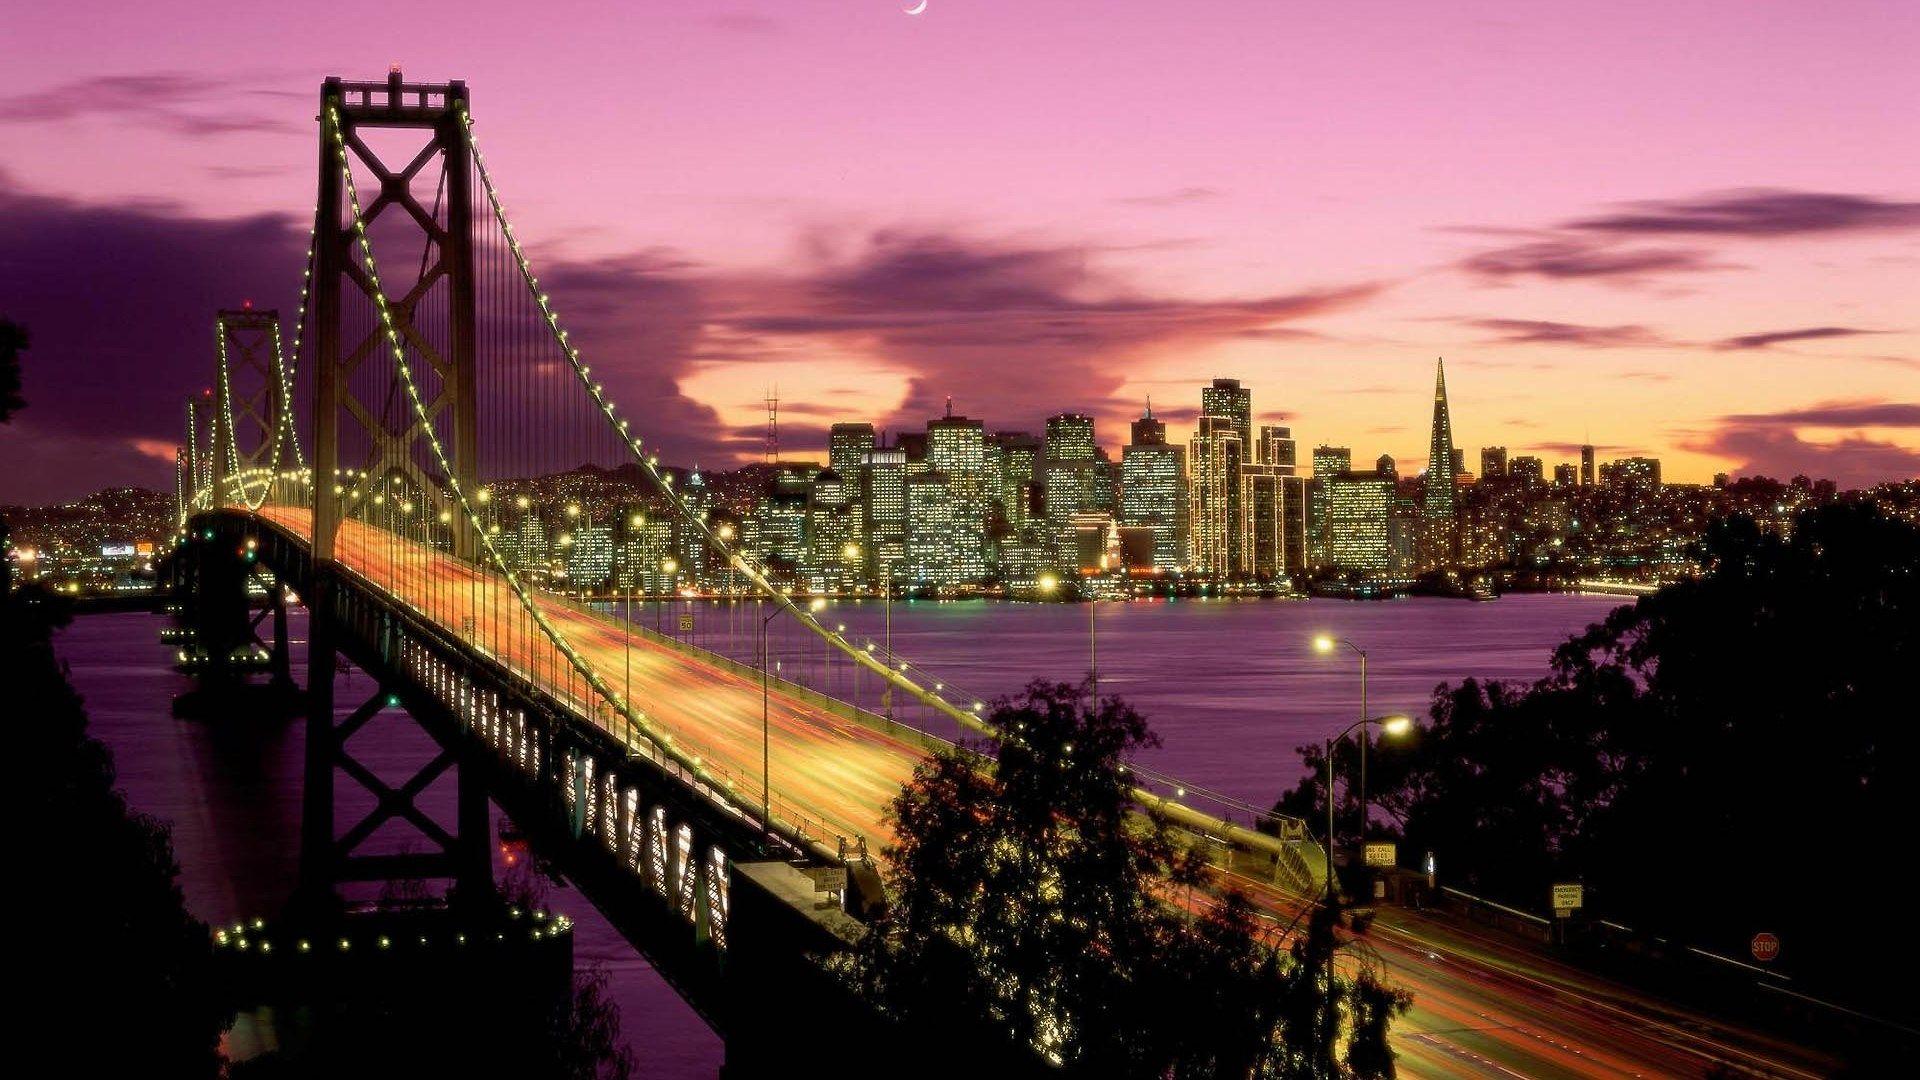 Manhattan Bridge Macbook Wallpapers Hd Tempest Bush 2017 03 26